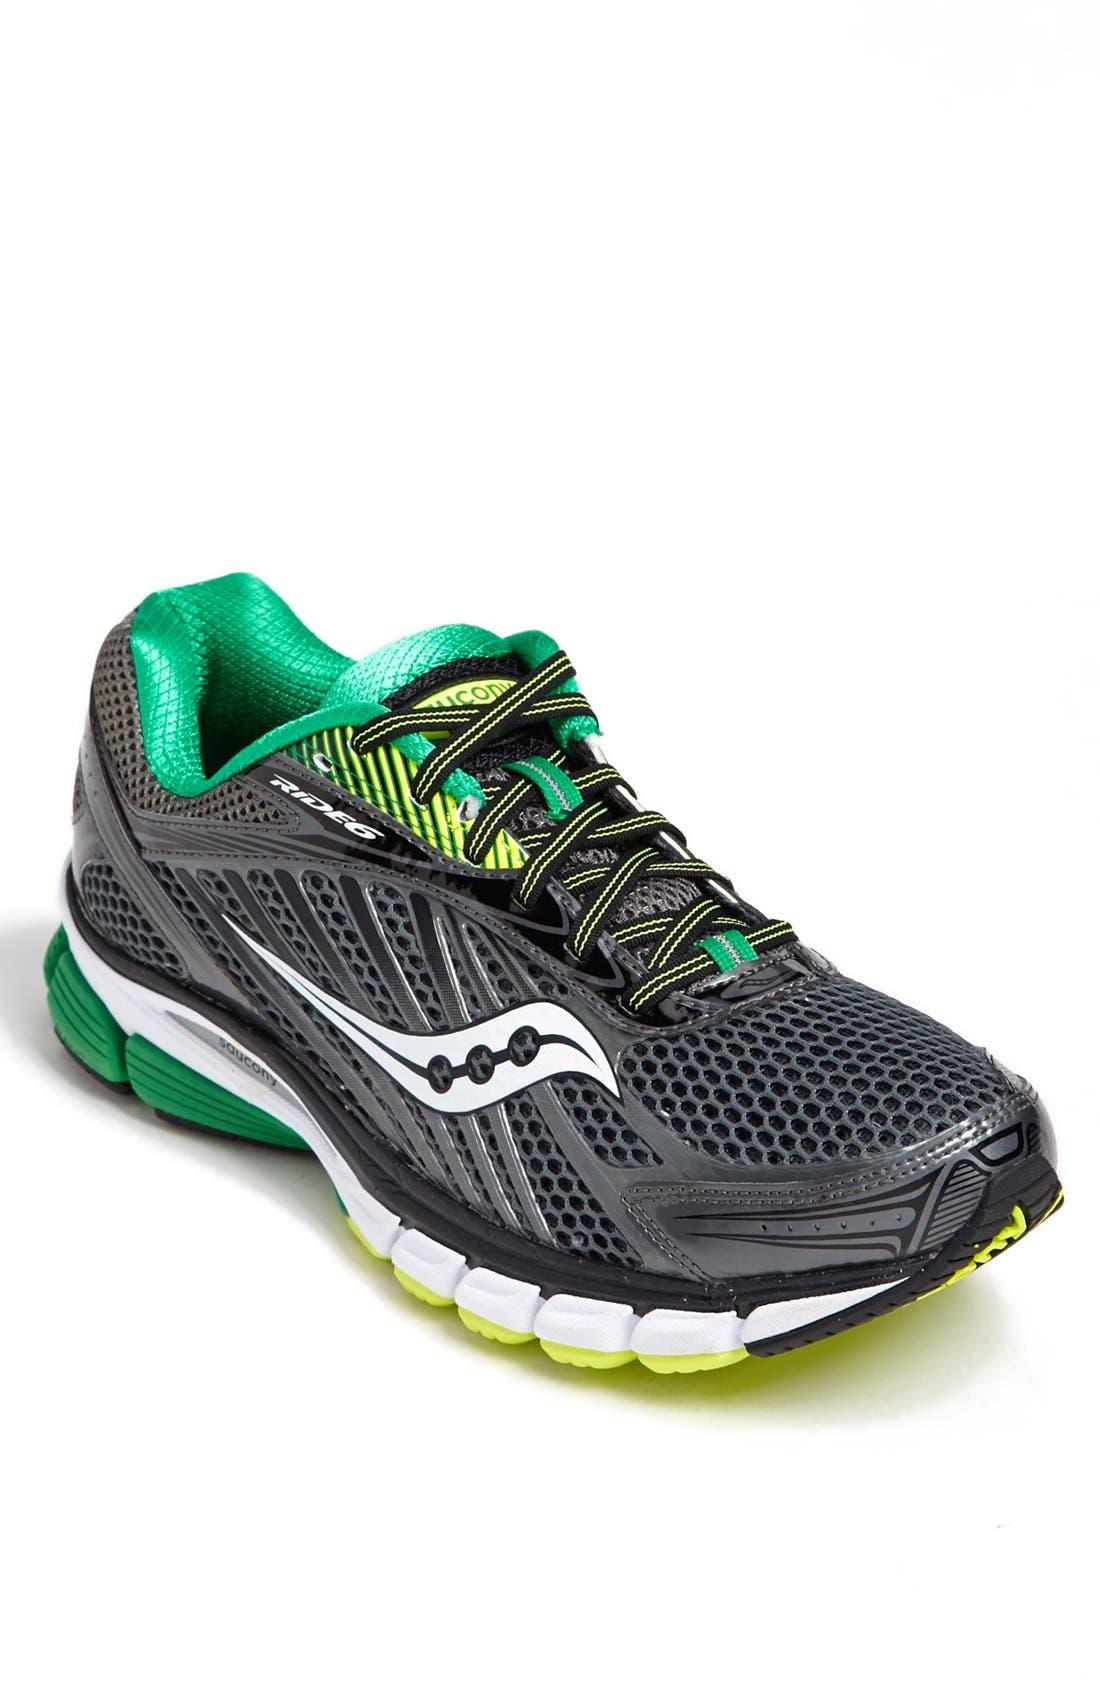 Main Image - Saucony 'Ride 6' Running Shoe (Men)